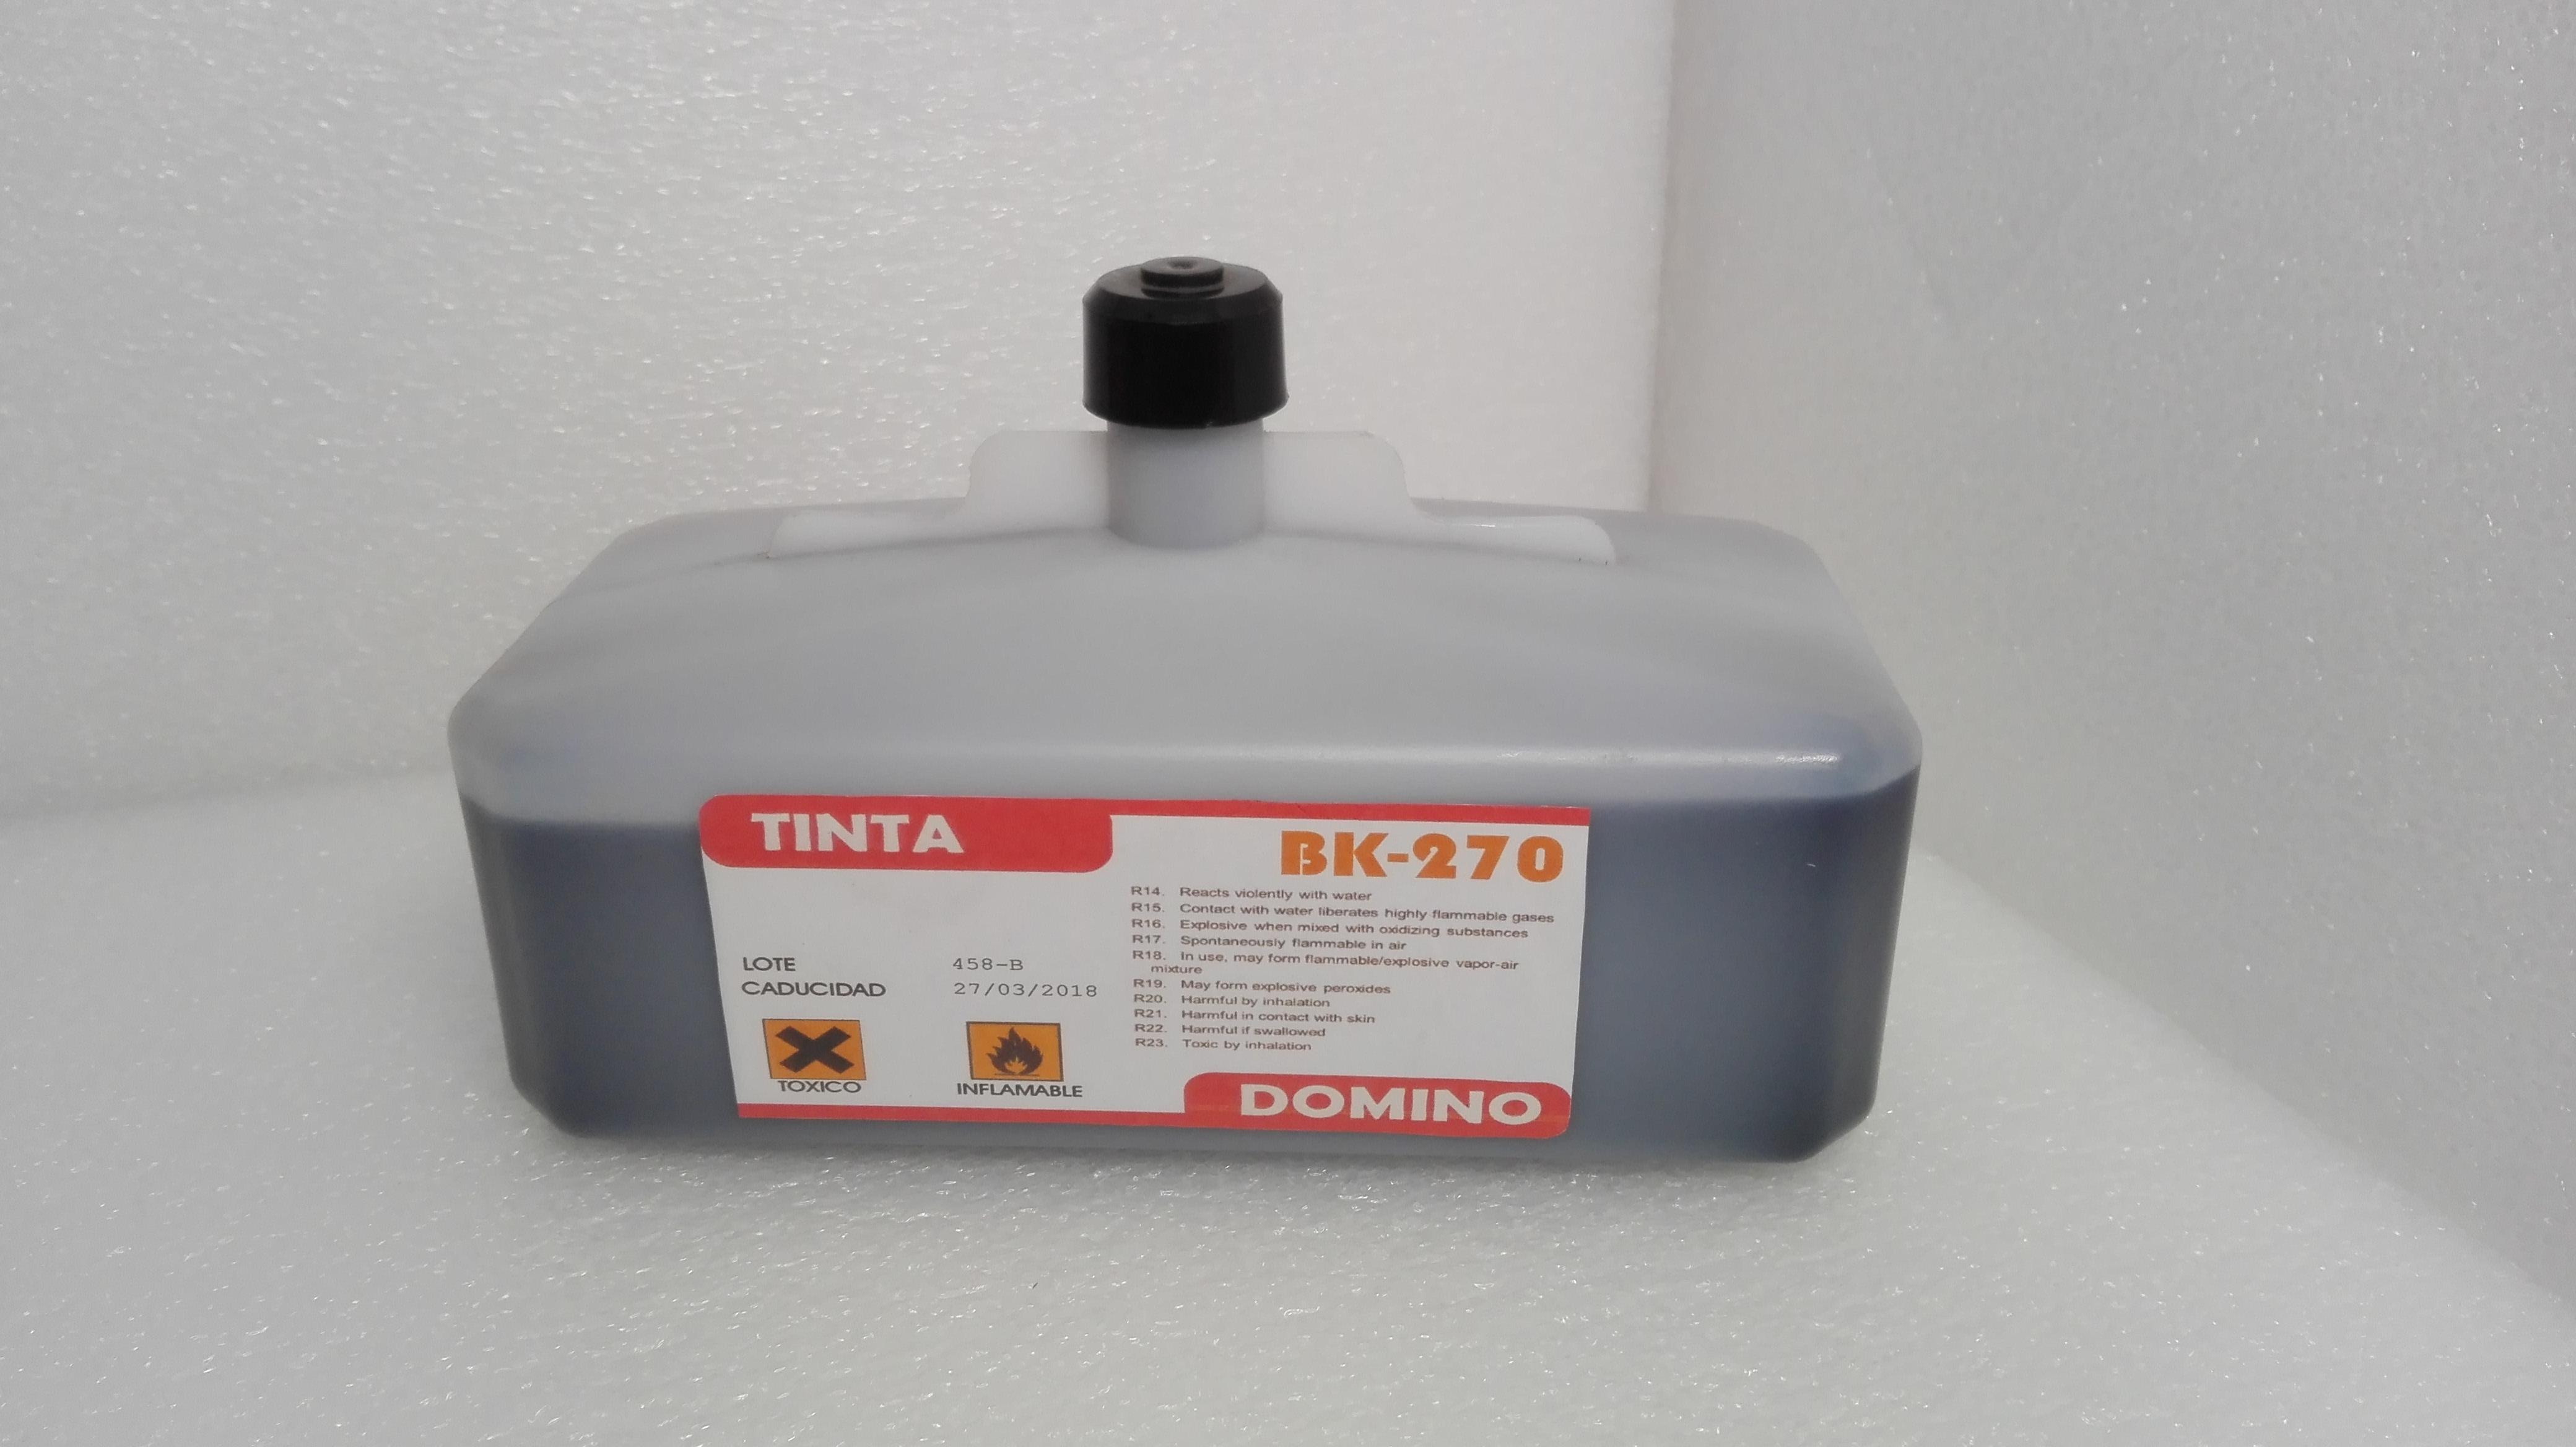 Tinta compatible Domino